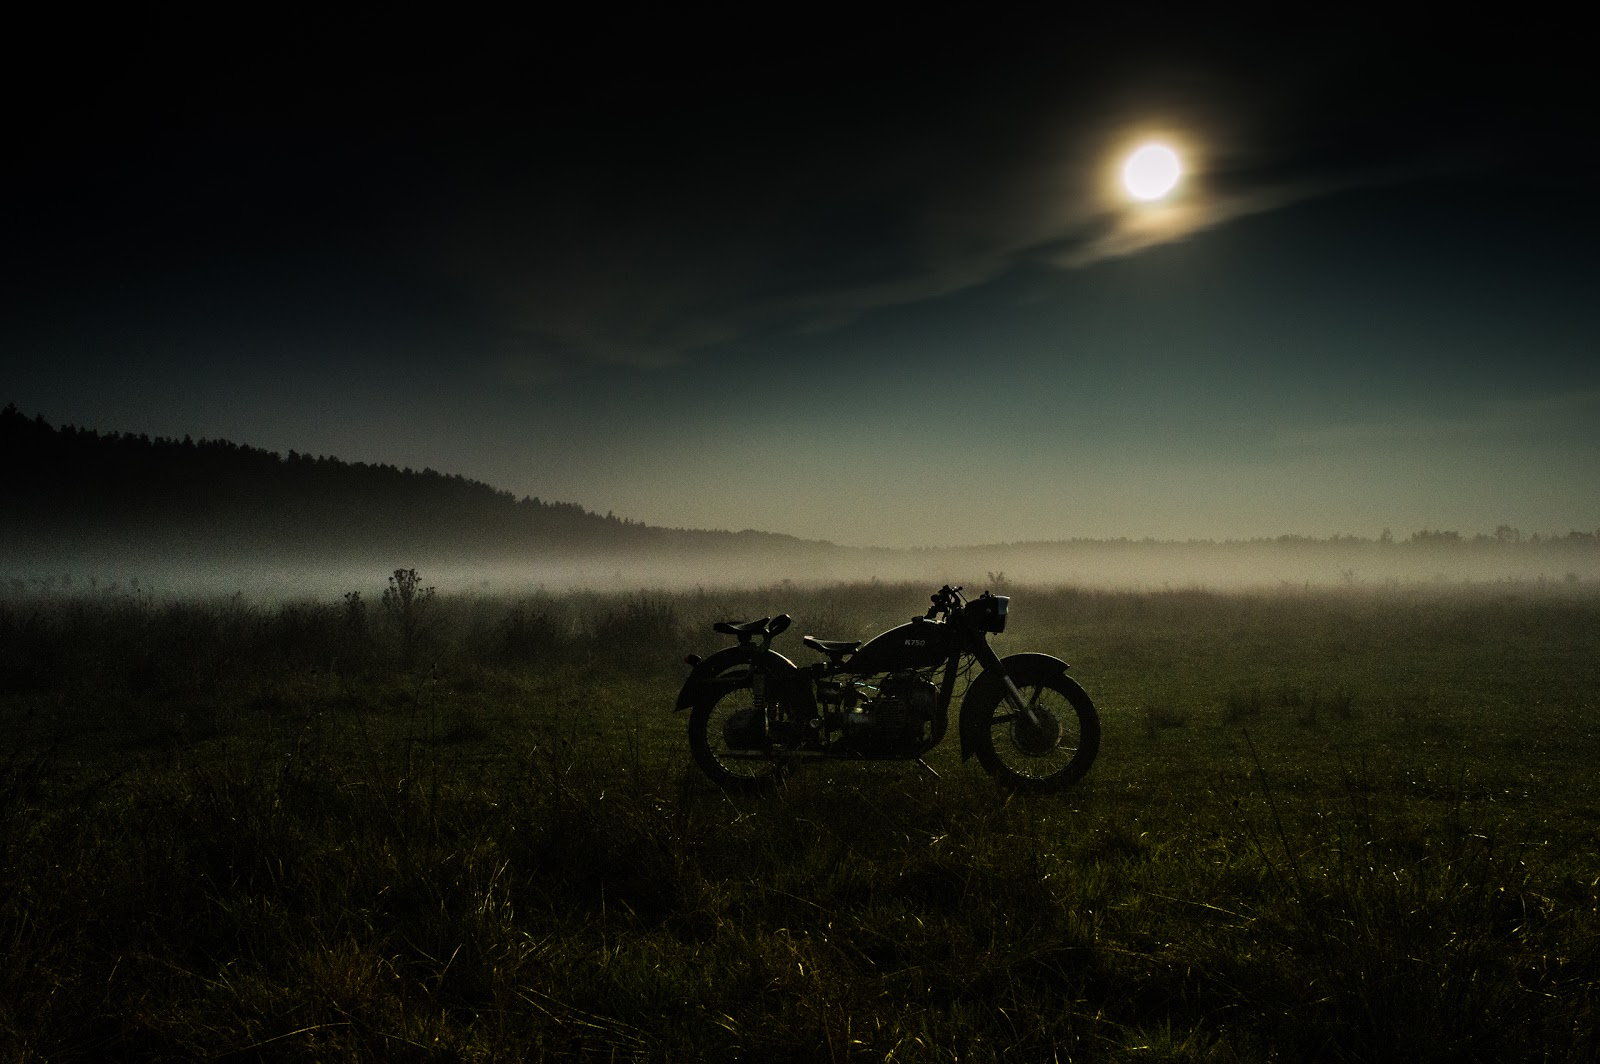 Житомирський район с. Березина, мотоцикл в полі